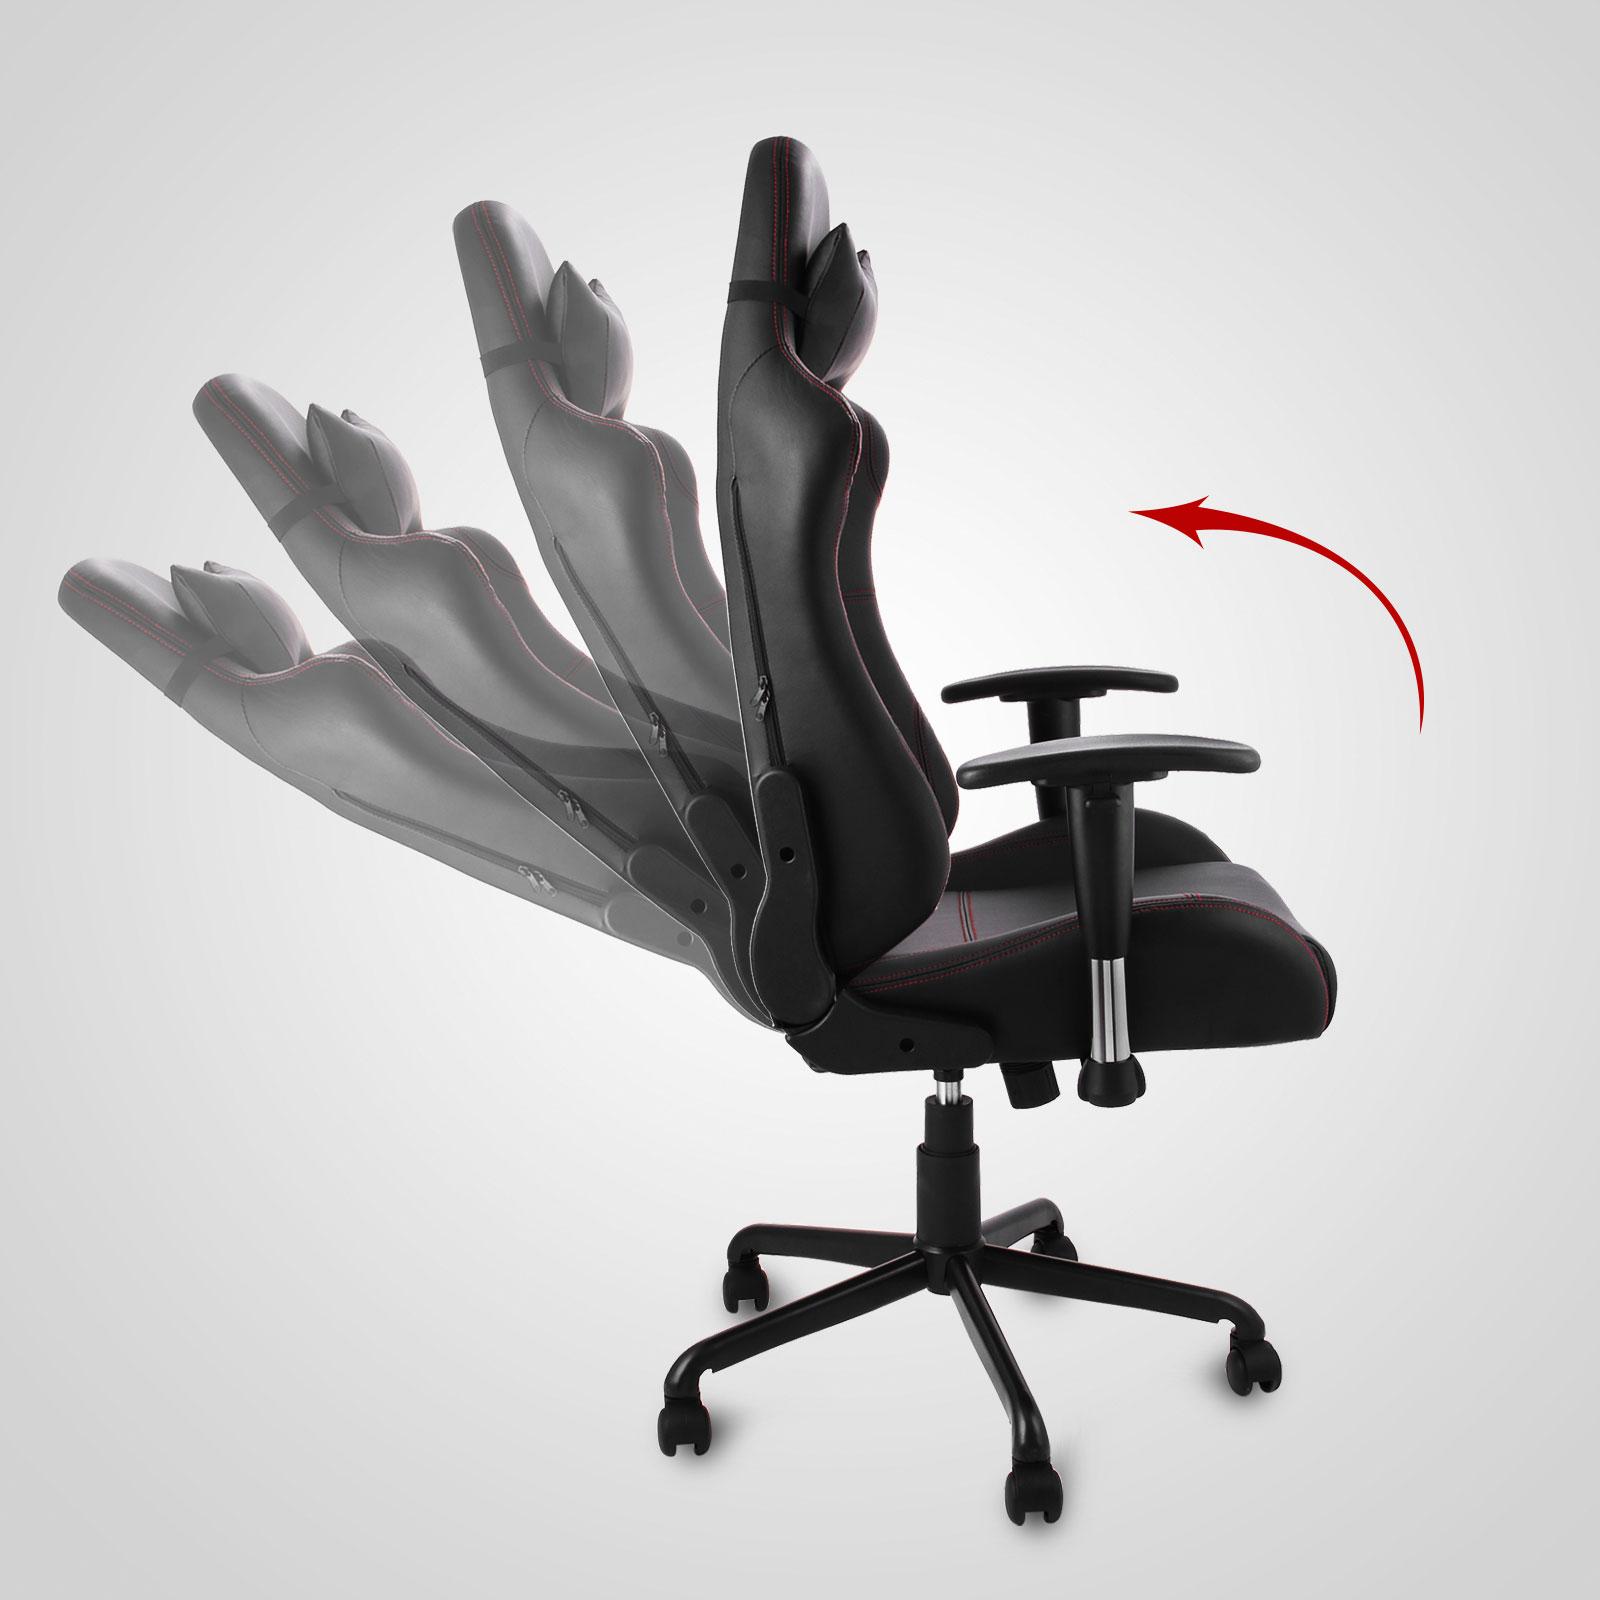 b rostuhl chefsessel racer sessel gaming stuhl drehstuhl office chair racing ebay. Black Bedroom Furniture Sets. Home Design Ideas